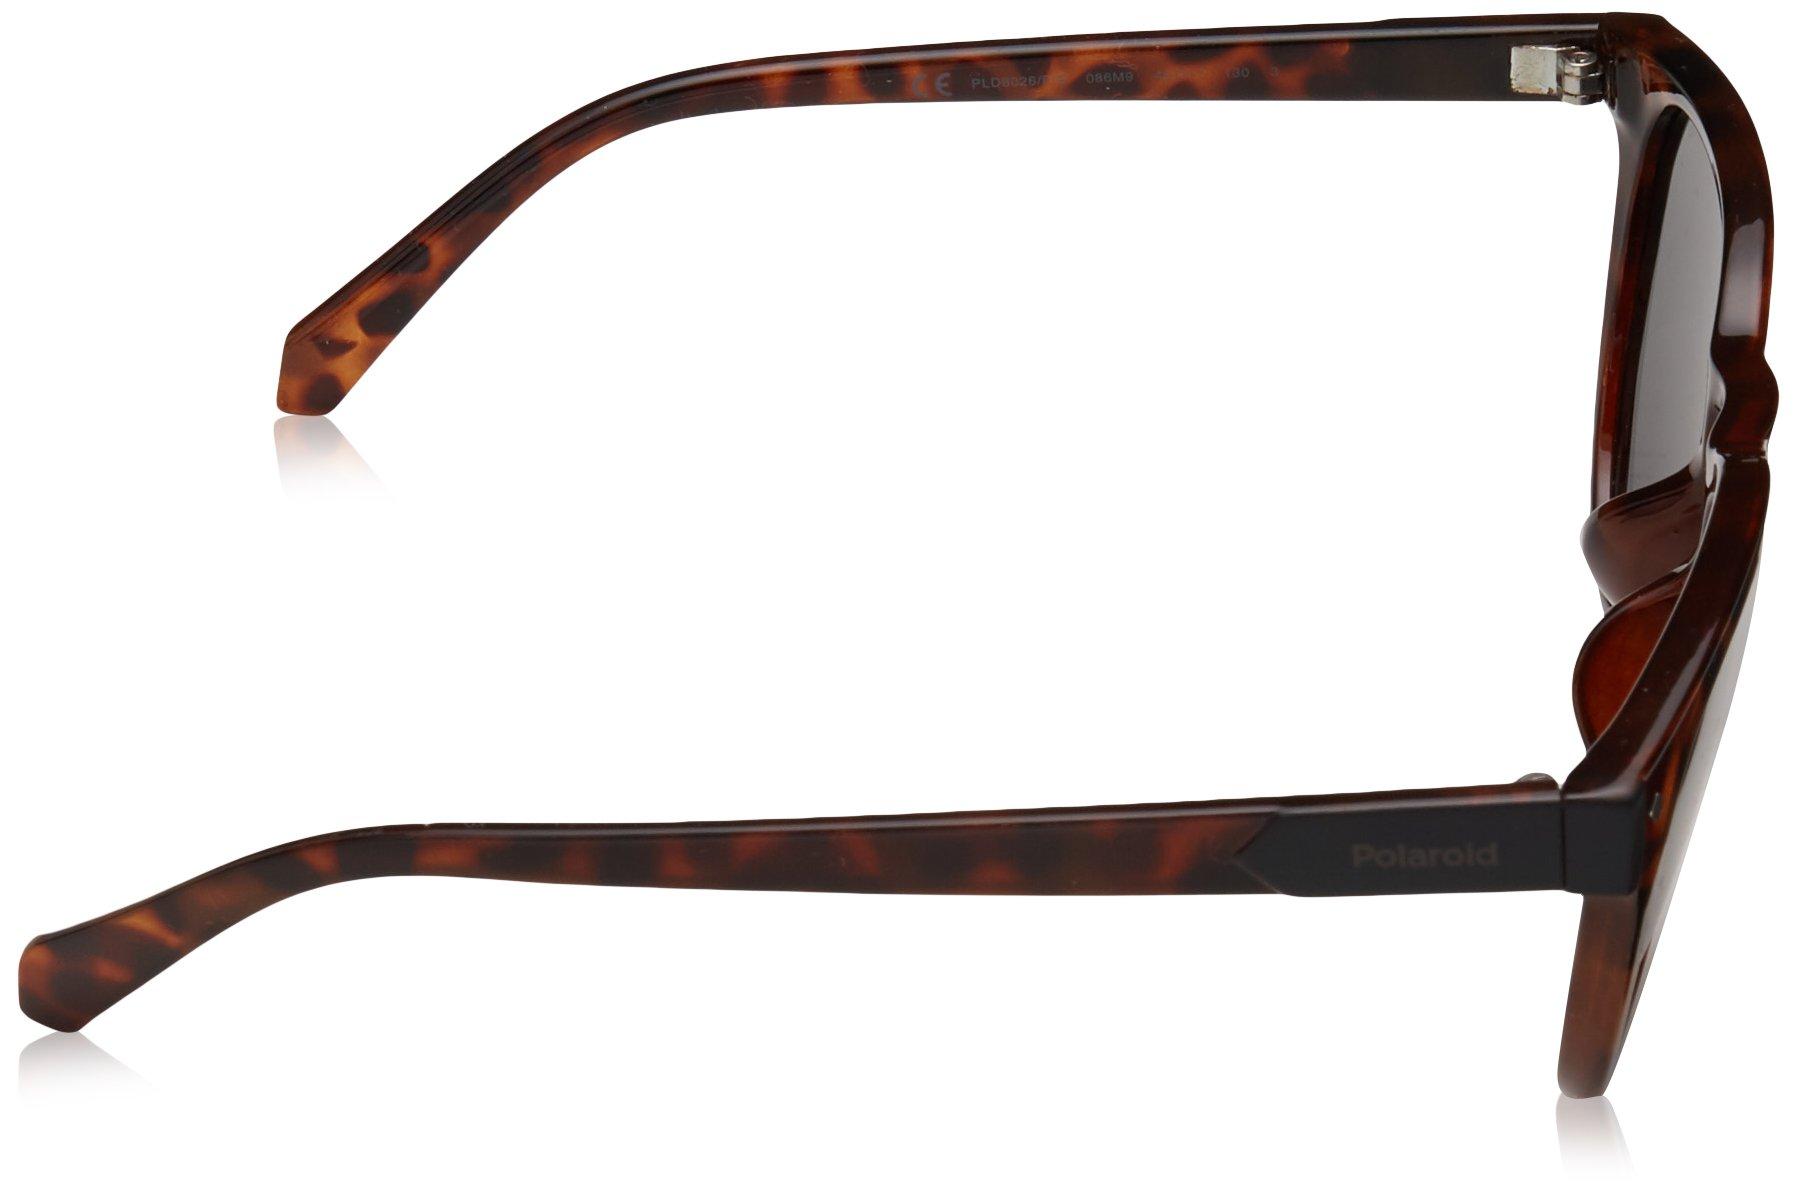 Polaroid Sunglasses Girls' Pld8026fs Polarized Oval Sunglasses, DKHAVANA, 49 mm by Polaroid Sunglasses (Image #3)